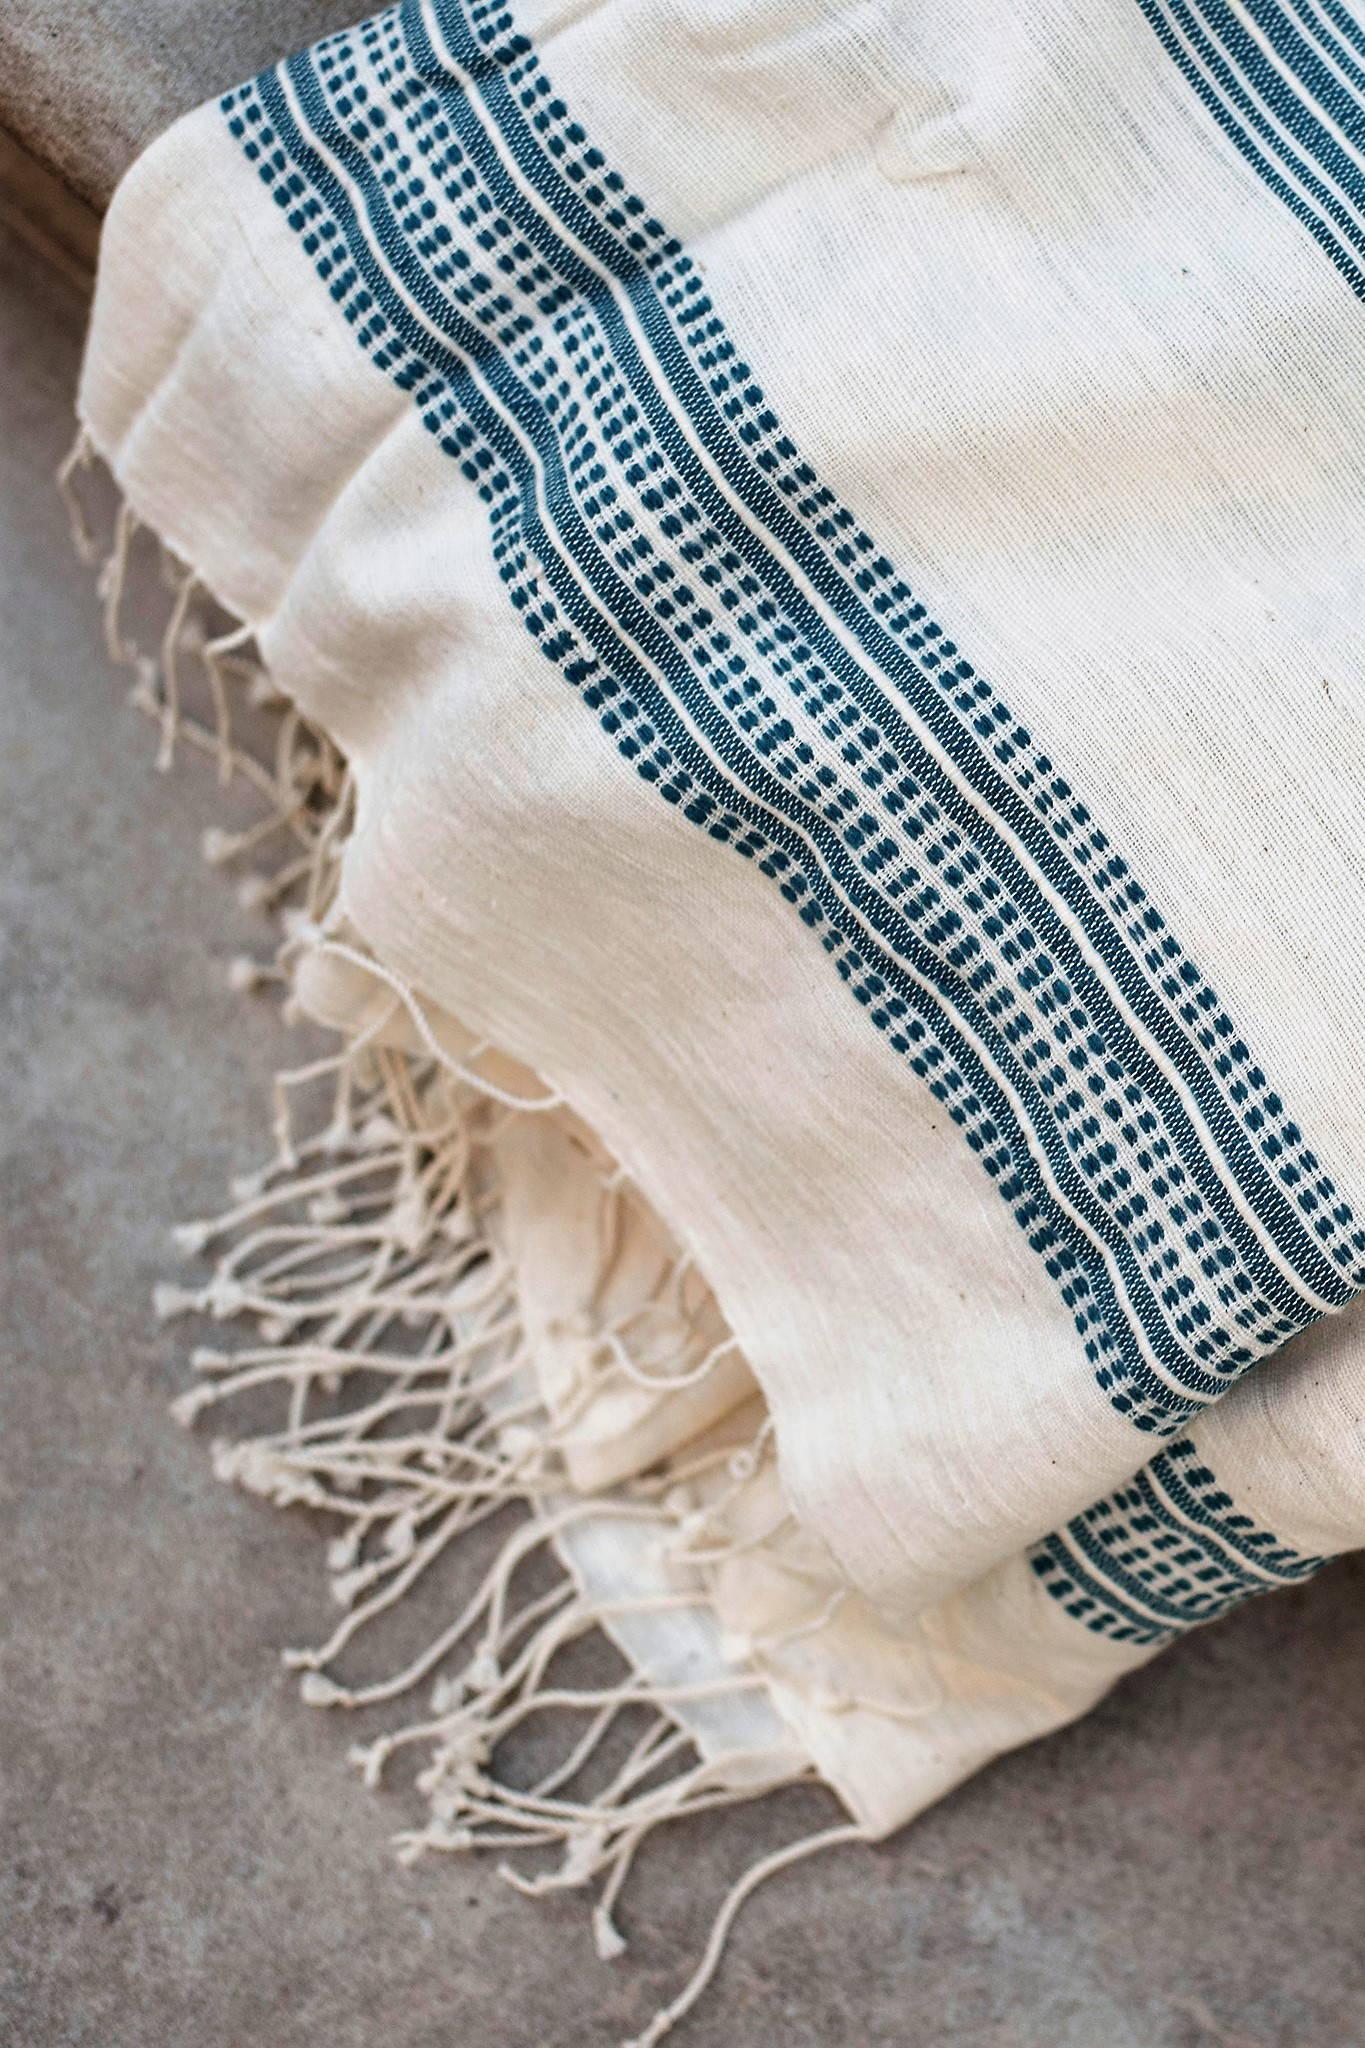 TANA ETHIOPIAN TOWEL - TEAL $ 75